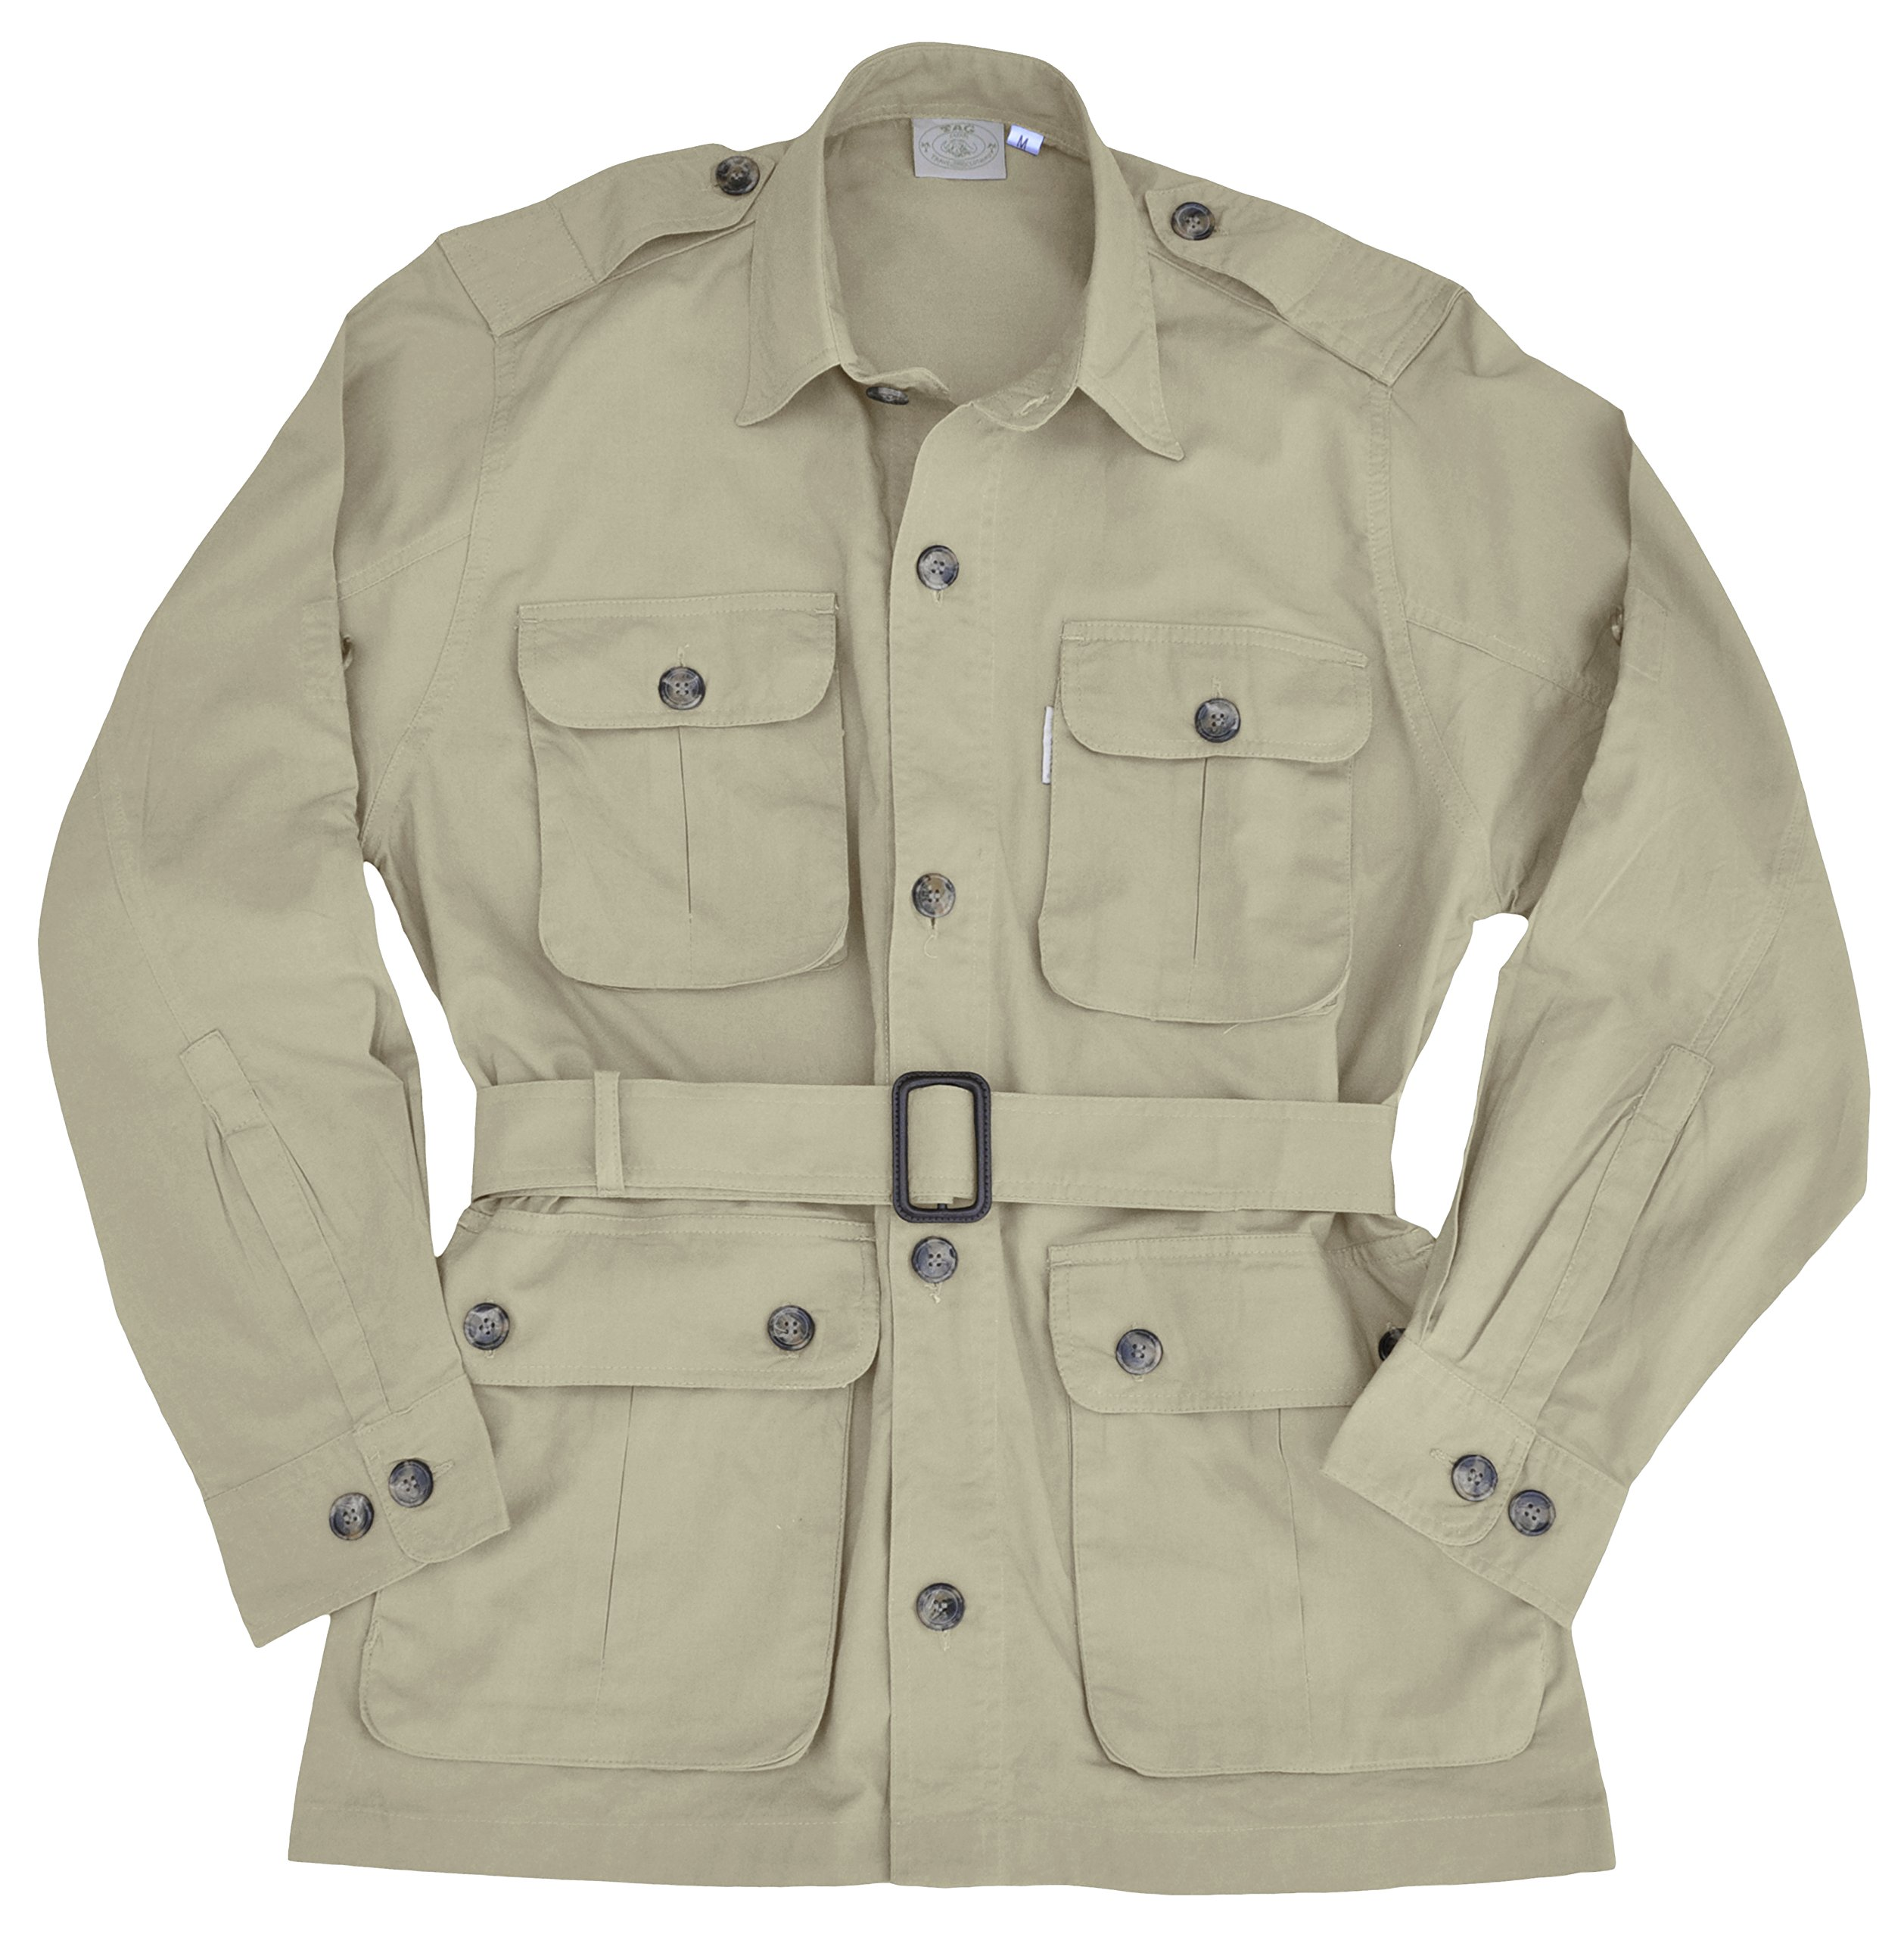 Safari Jacket for Men-Stone-X Large by Tag Safari